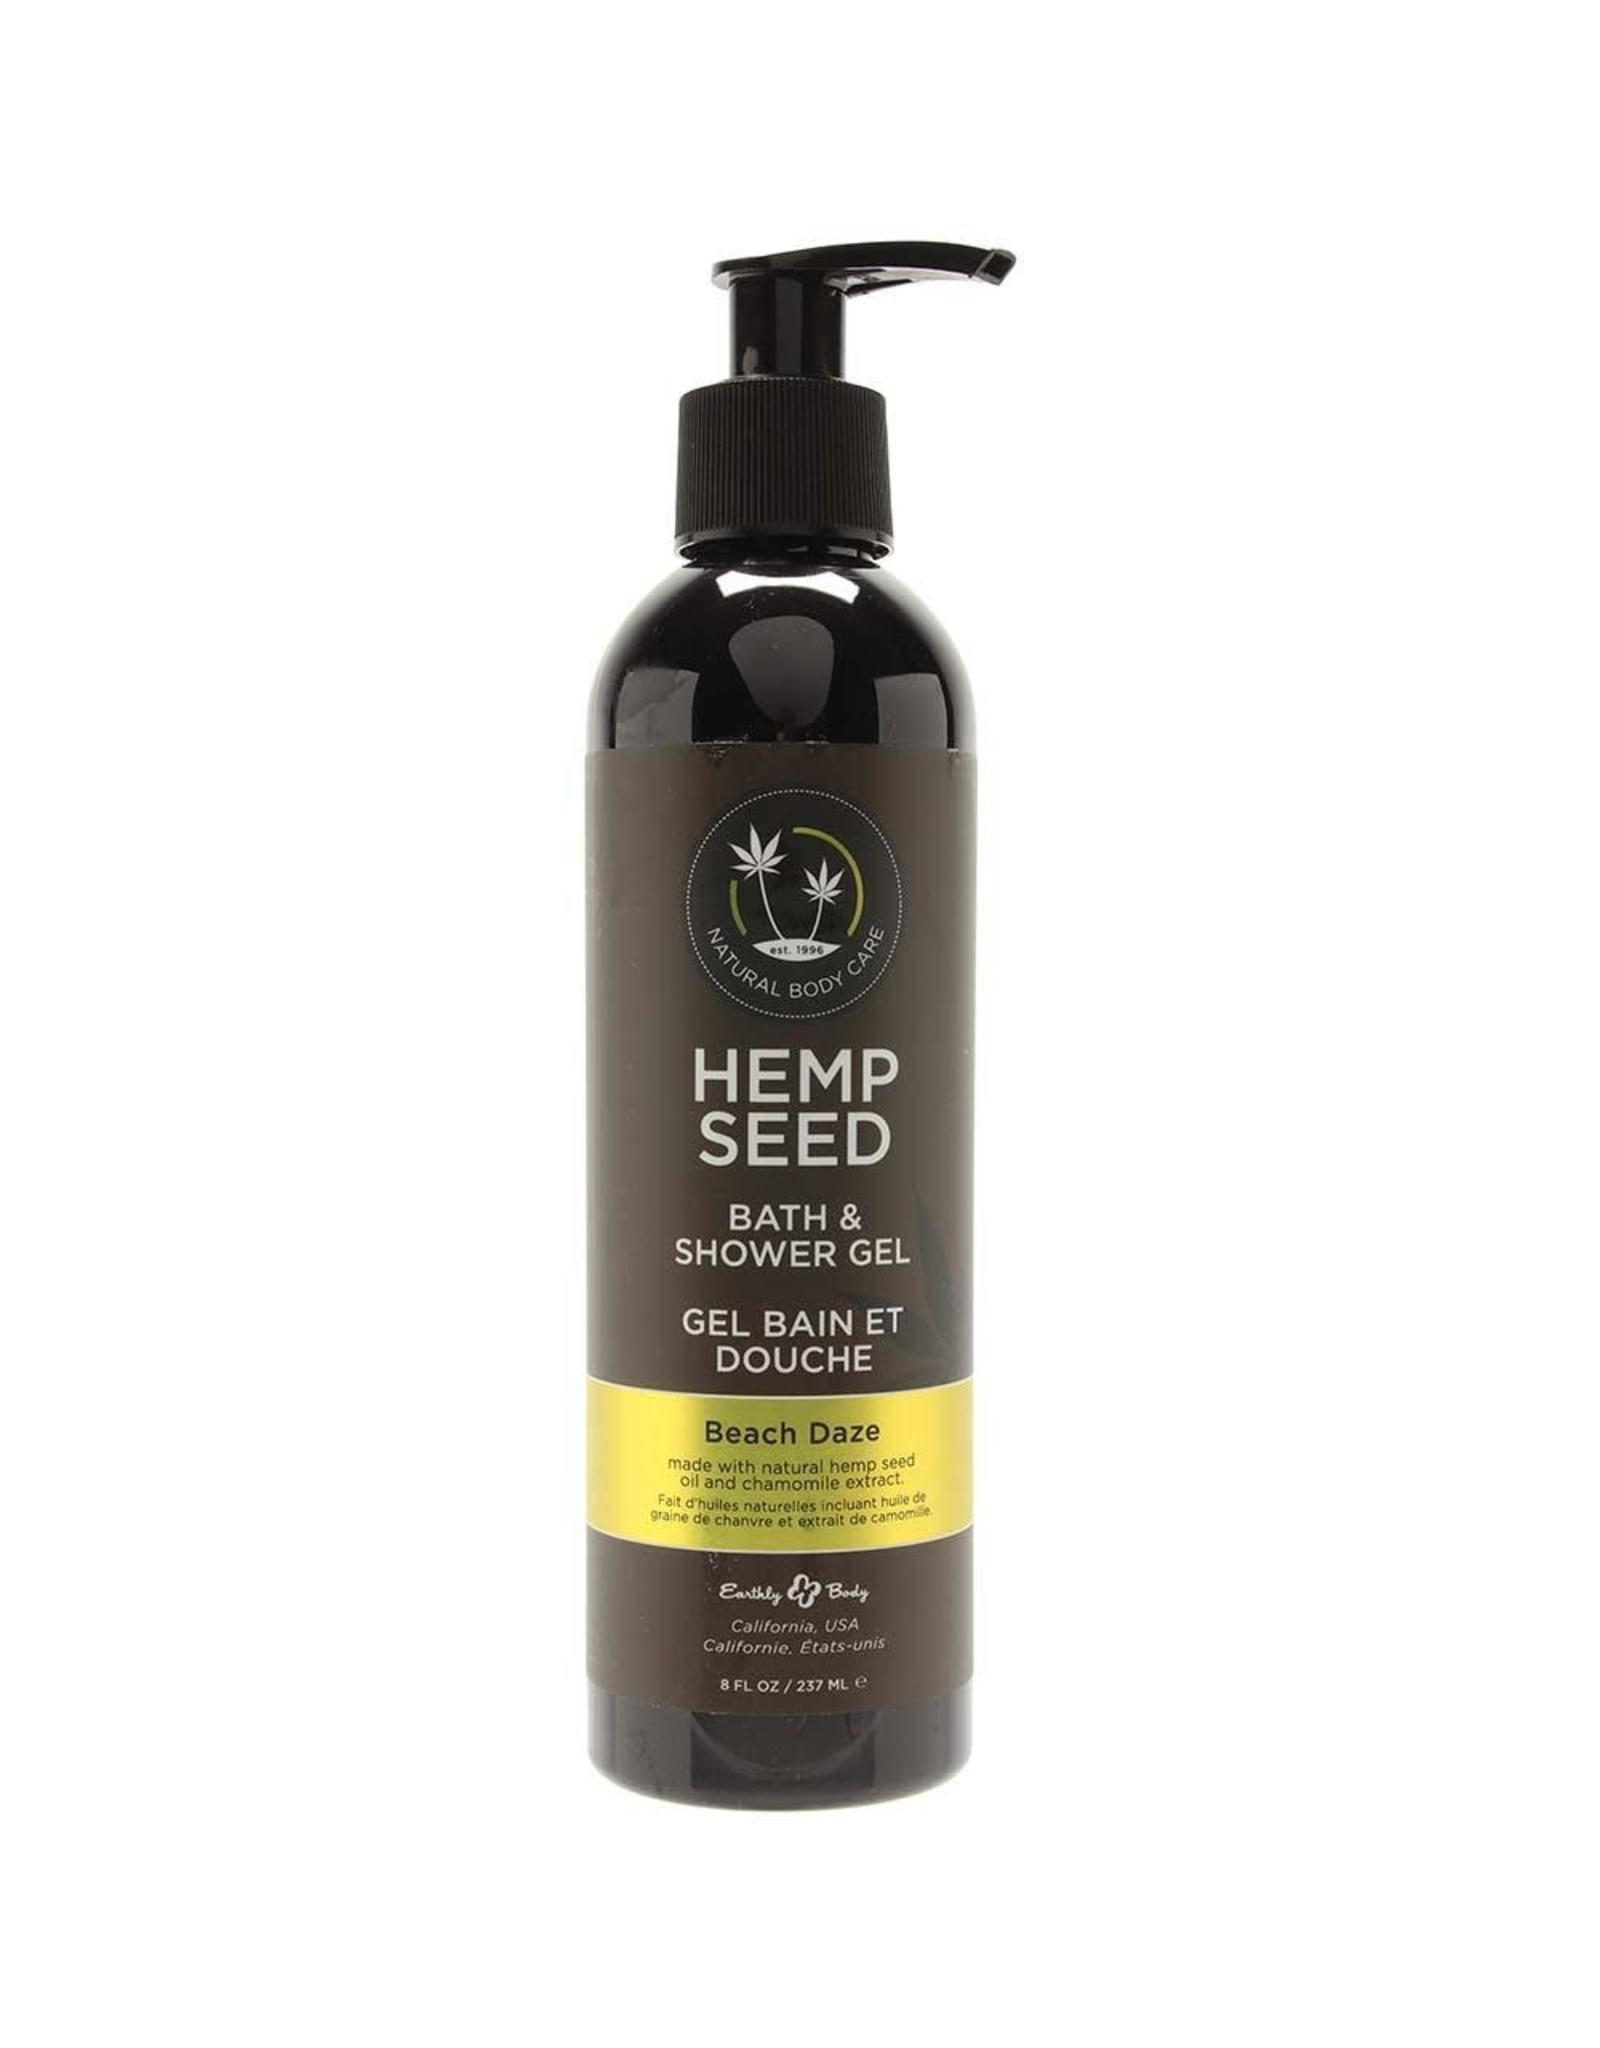 HEMP SEED - BATH AND SHOWER GEL - BEACH DAZE 8oz